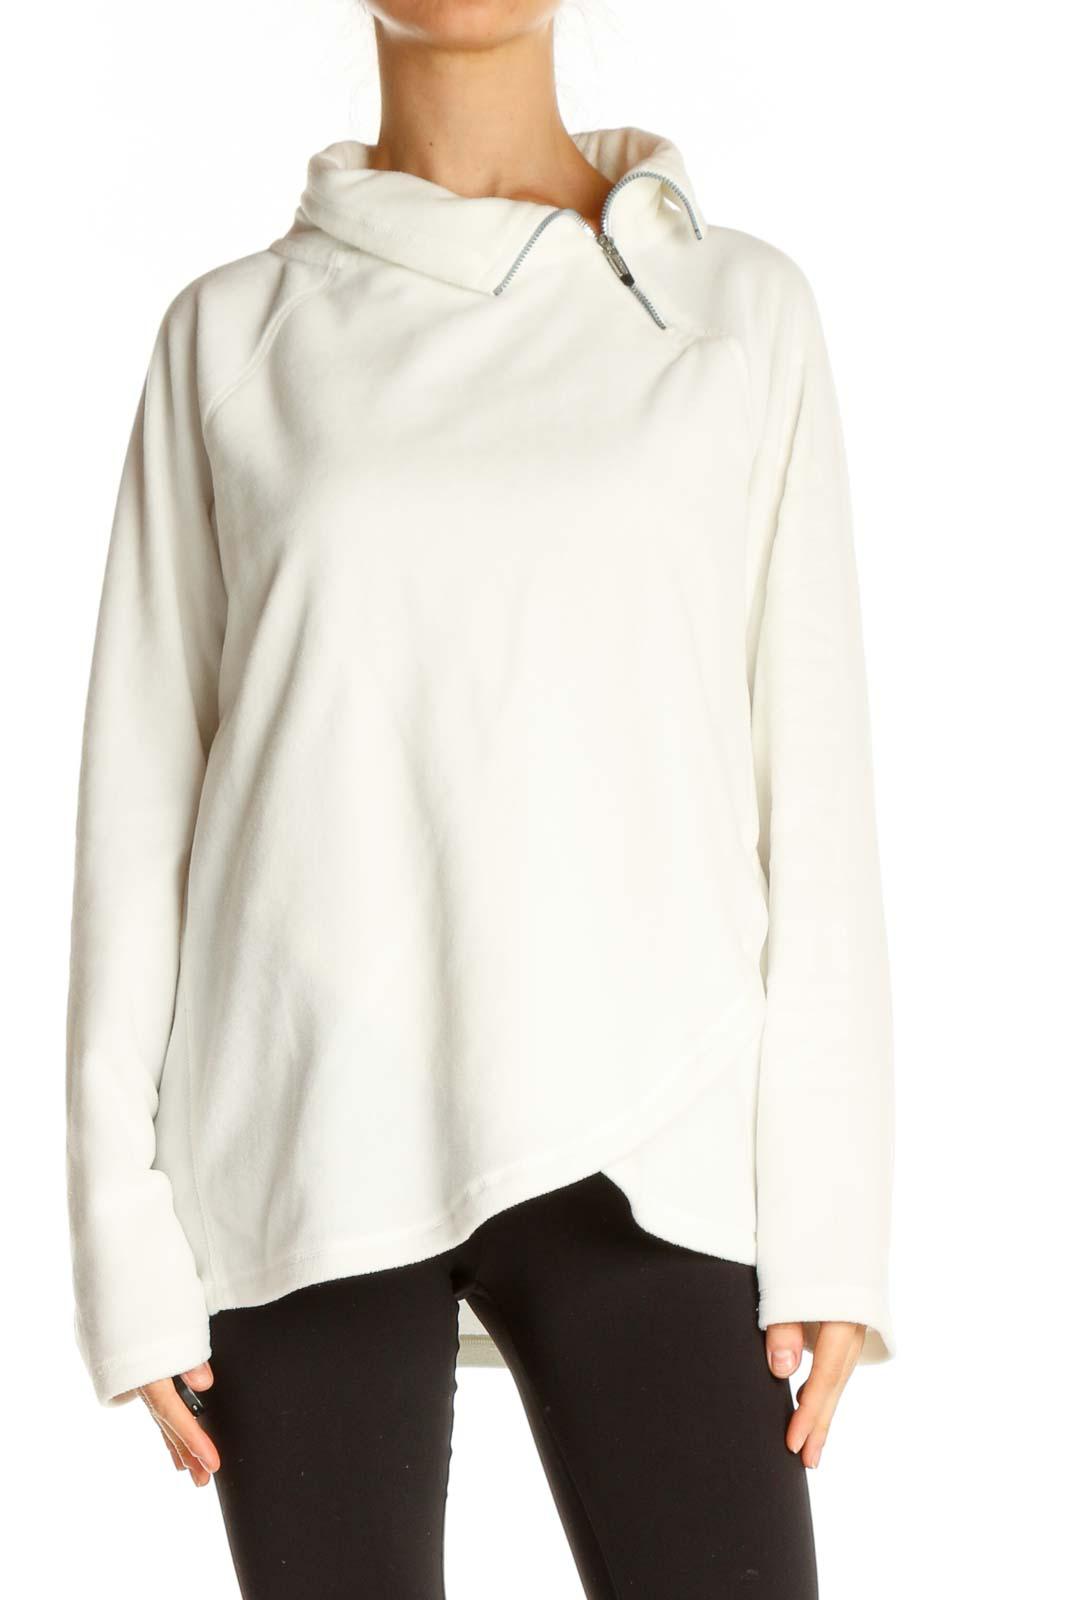 White Sweatshirt Front